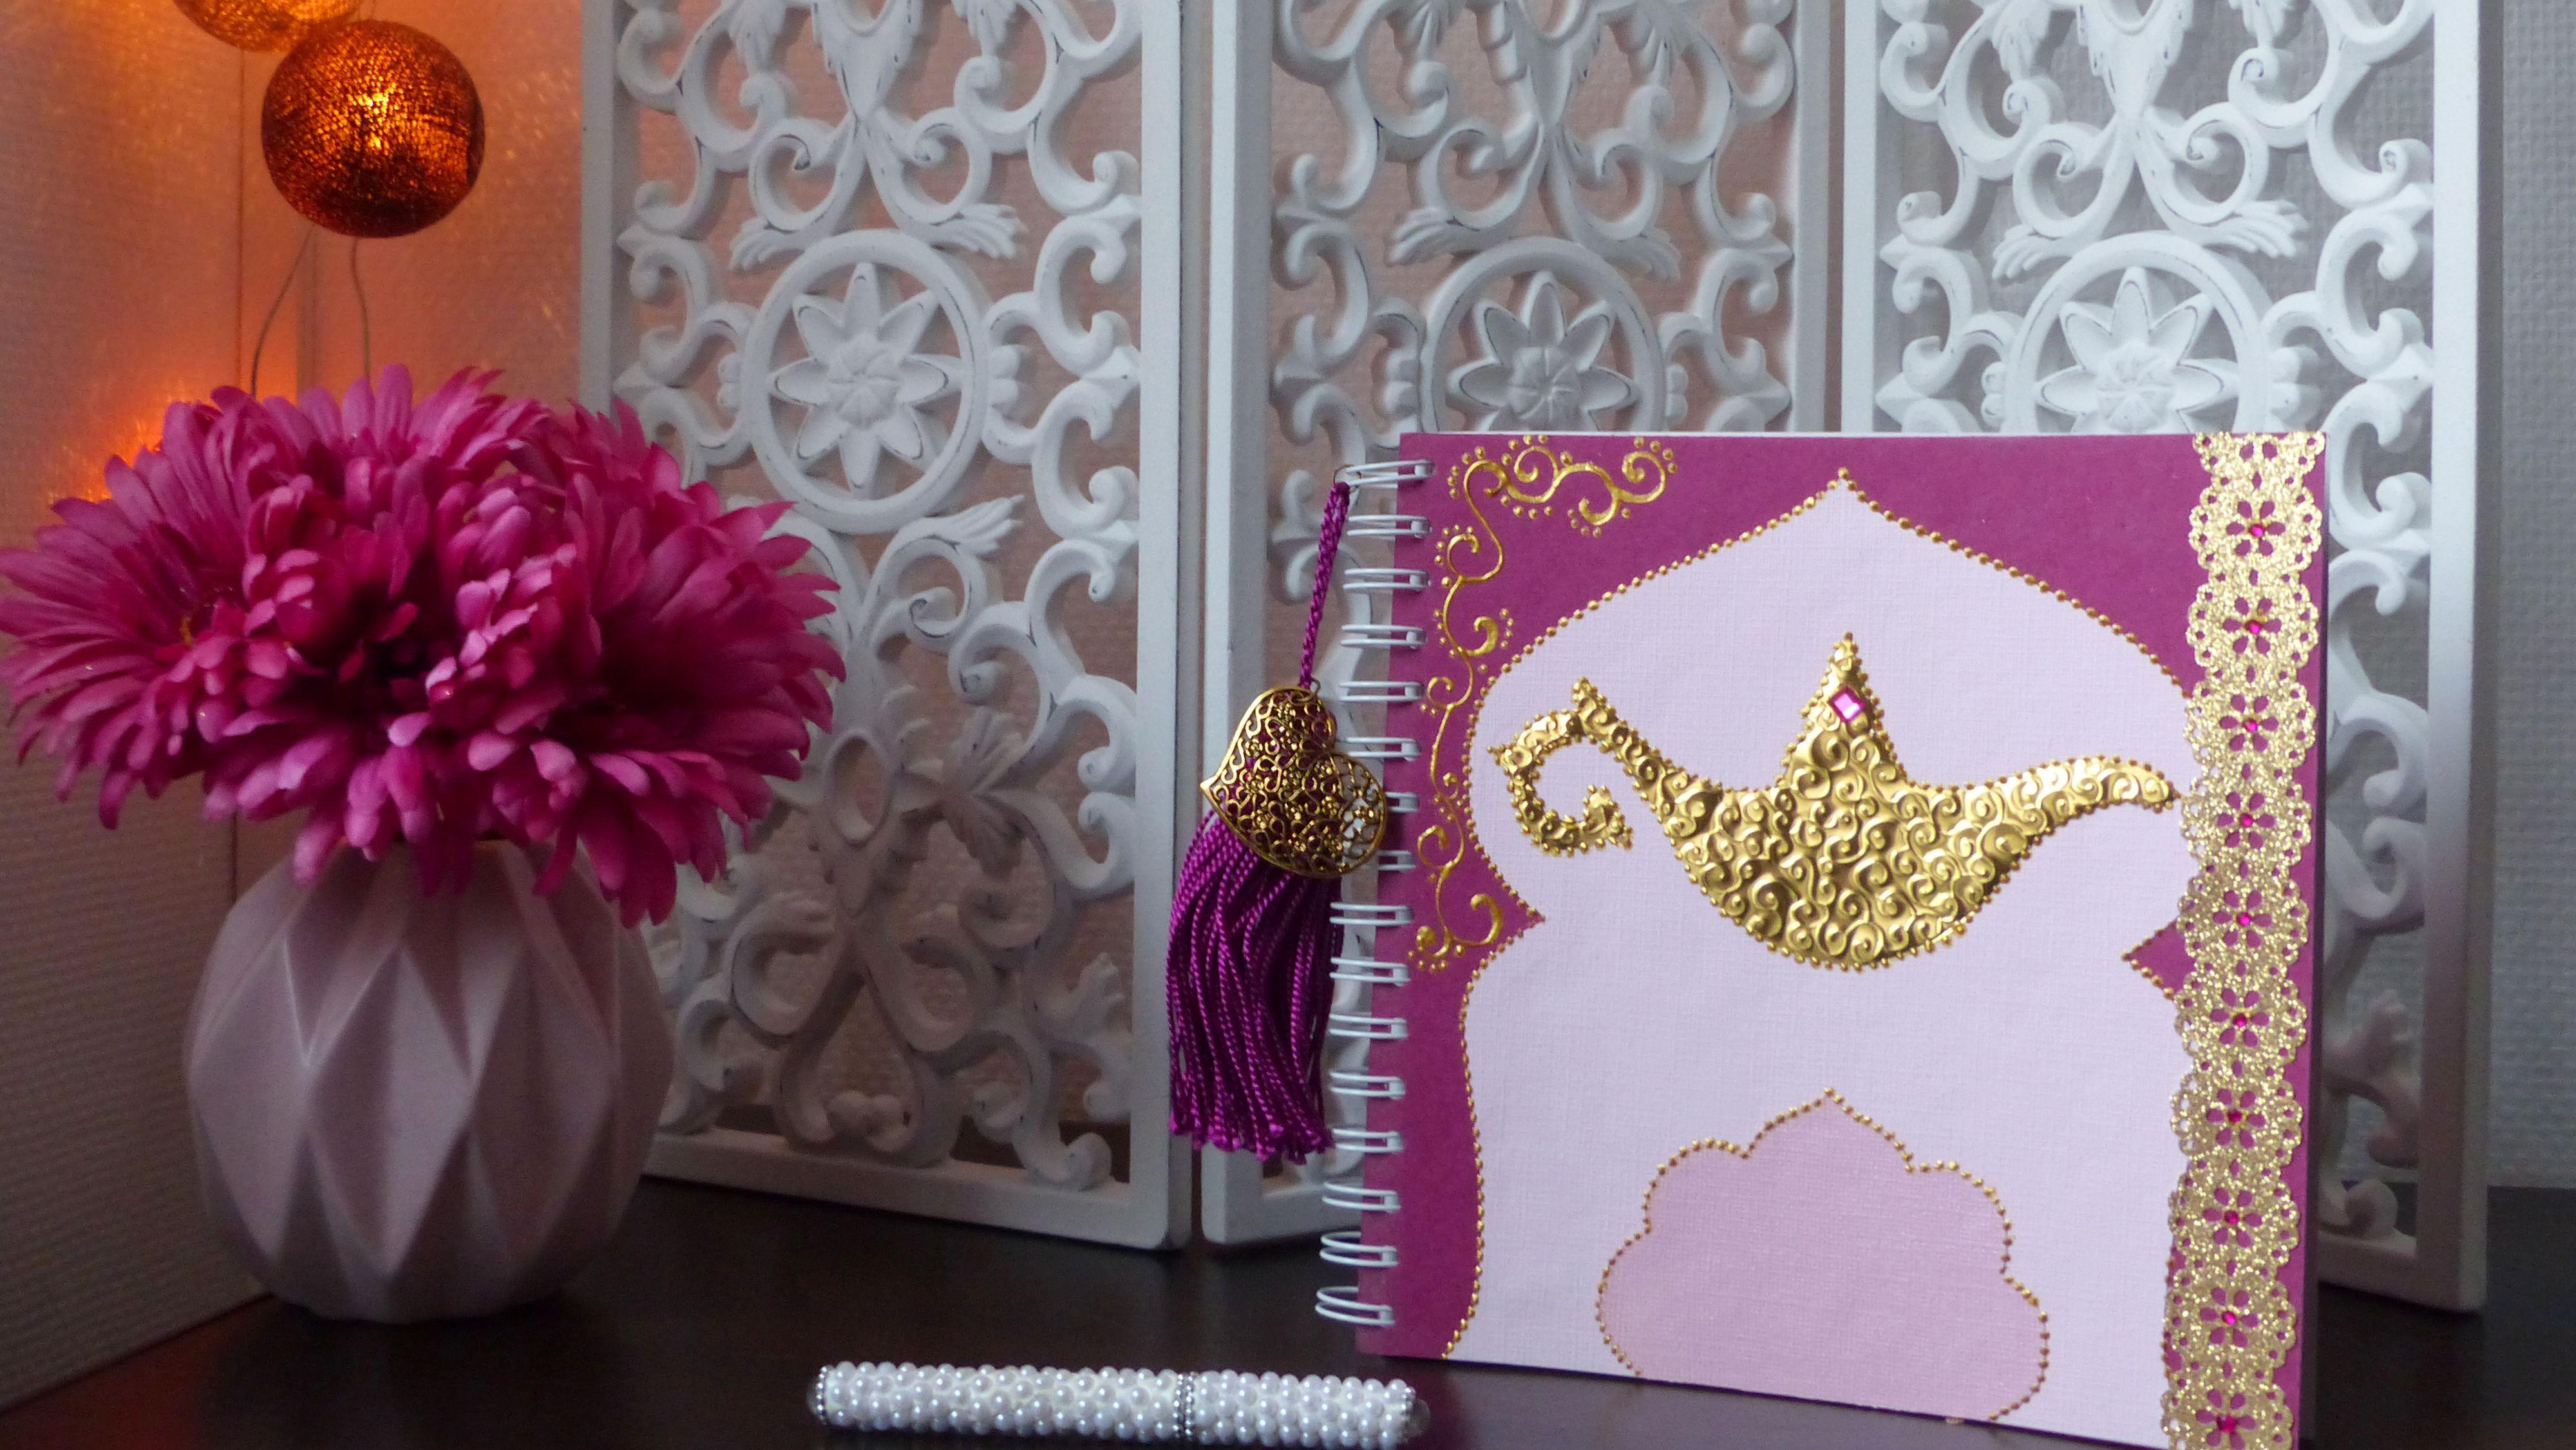 faire un livre dor oriental moroccan wedding aladdin oriental mariage diy oriental moroccan wedding pinterest - Livre D Or Mariage Oriental